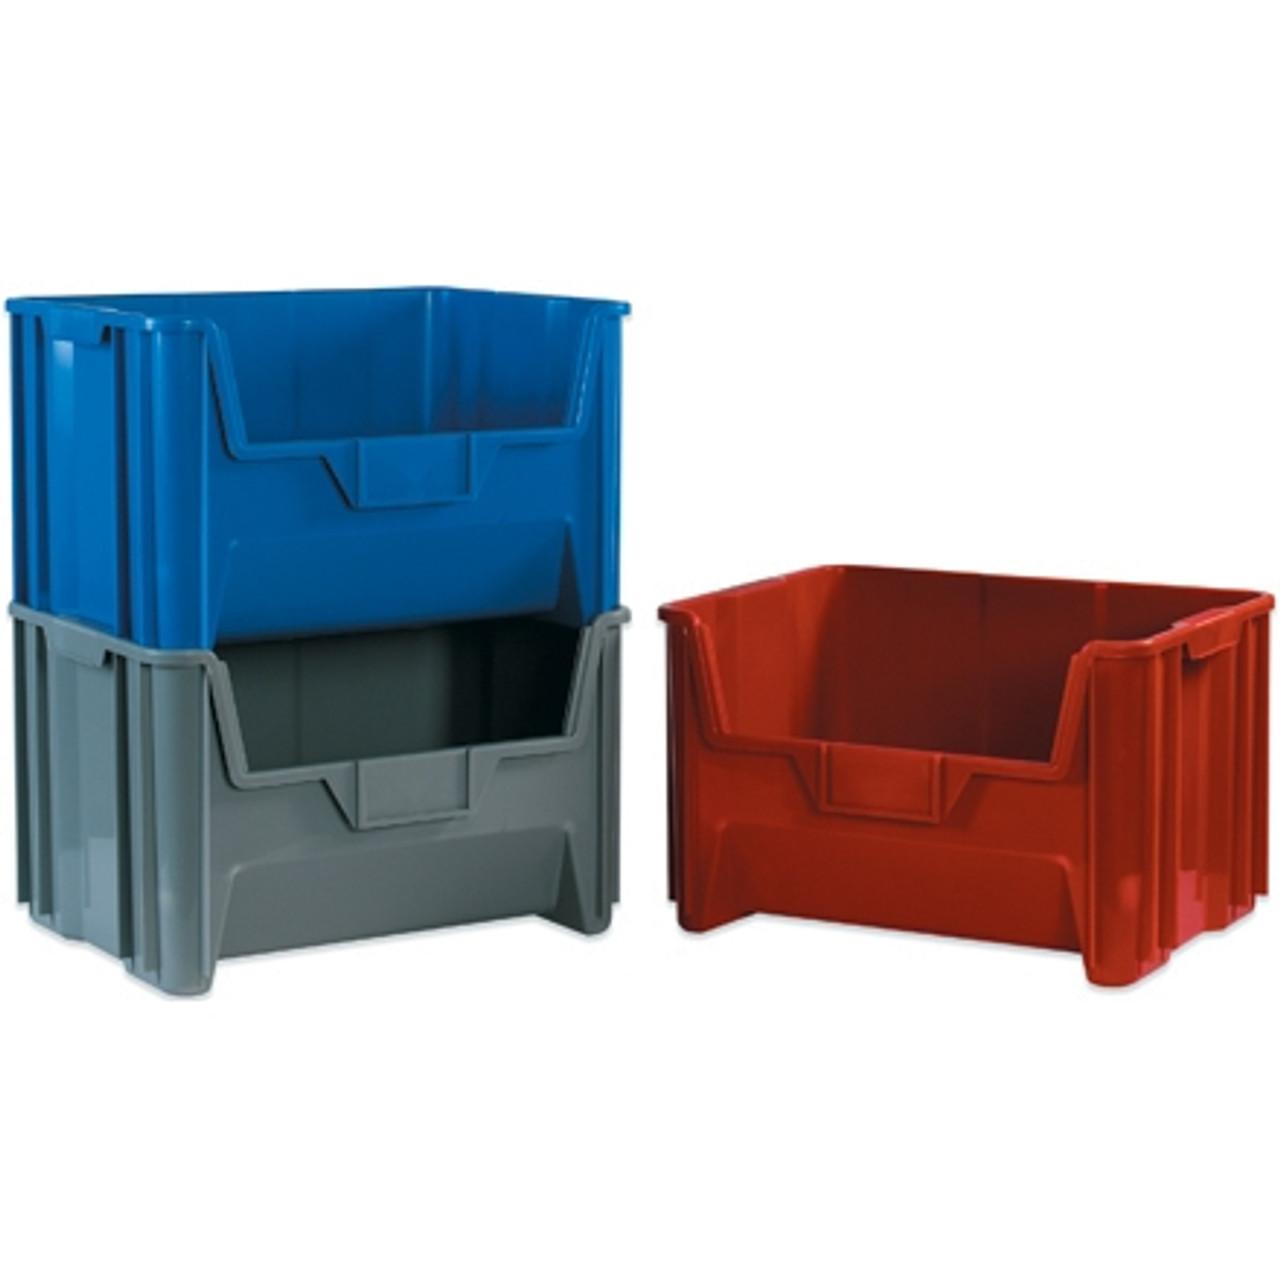 Shelving, Bins & Storage